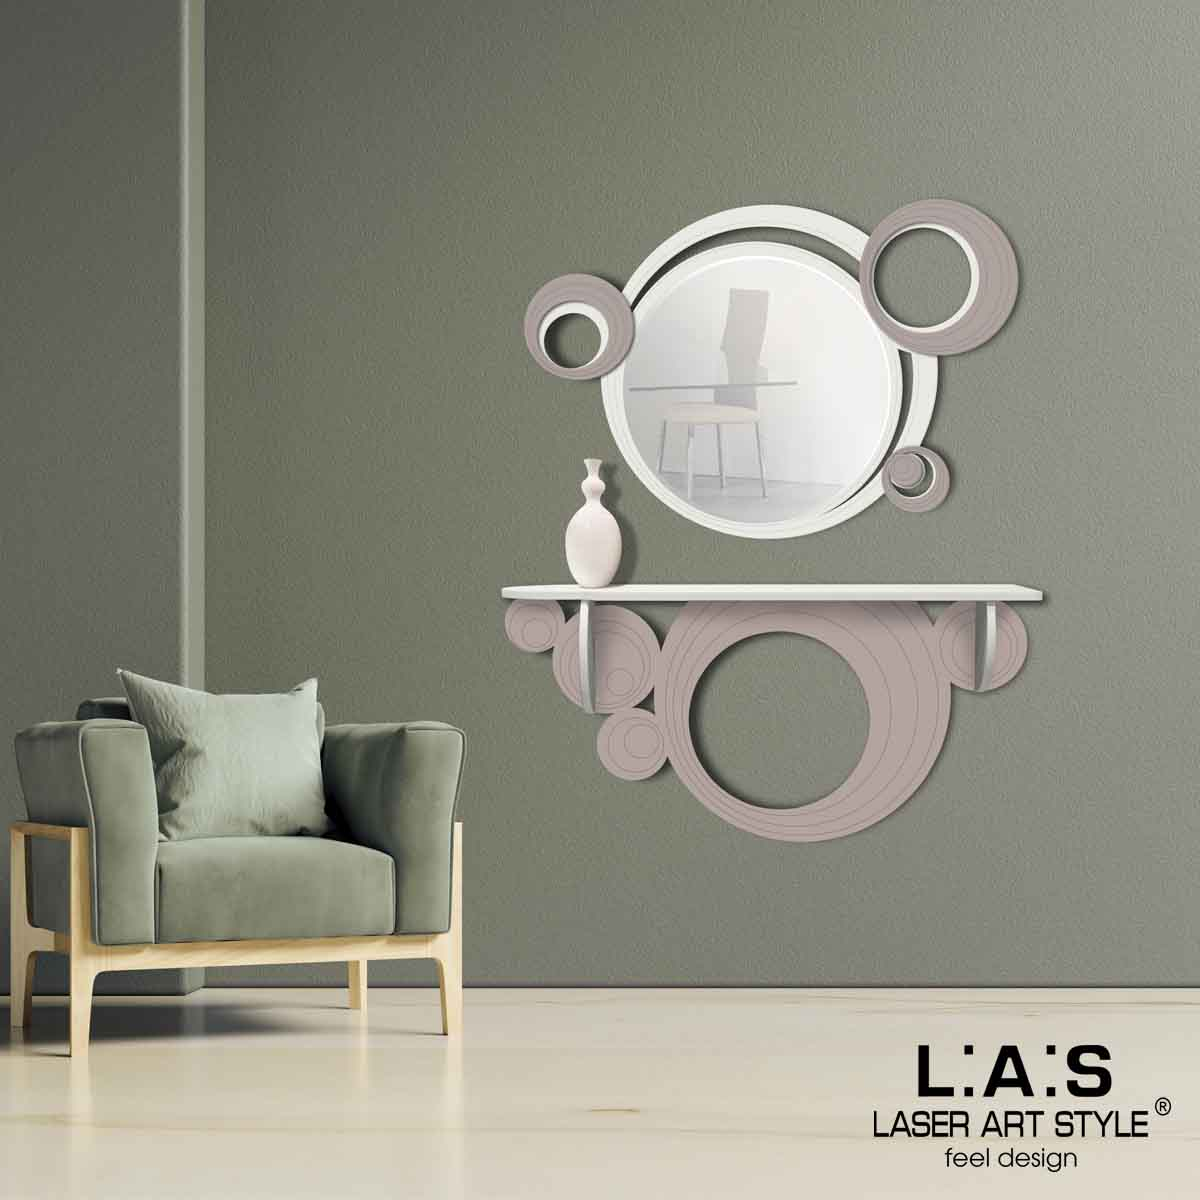 L:A:S - Laser Art Style - CONSOLLE INGRESSO DESIGN MODERNO – SI-279 PANNA-TORTORA